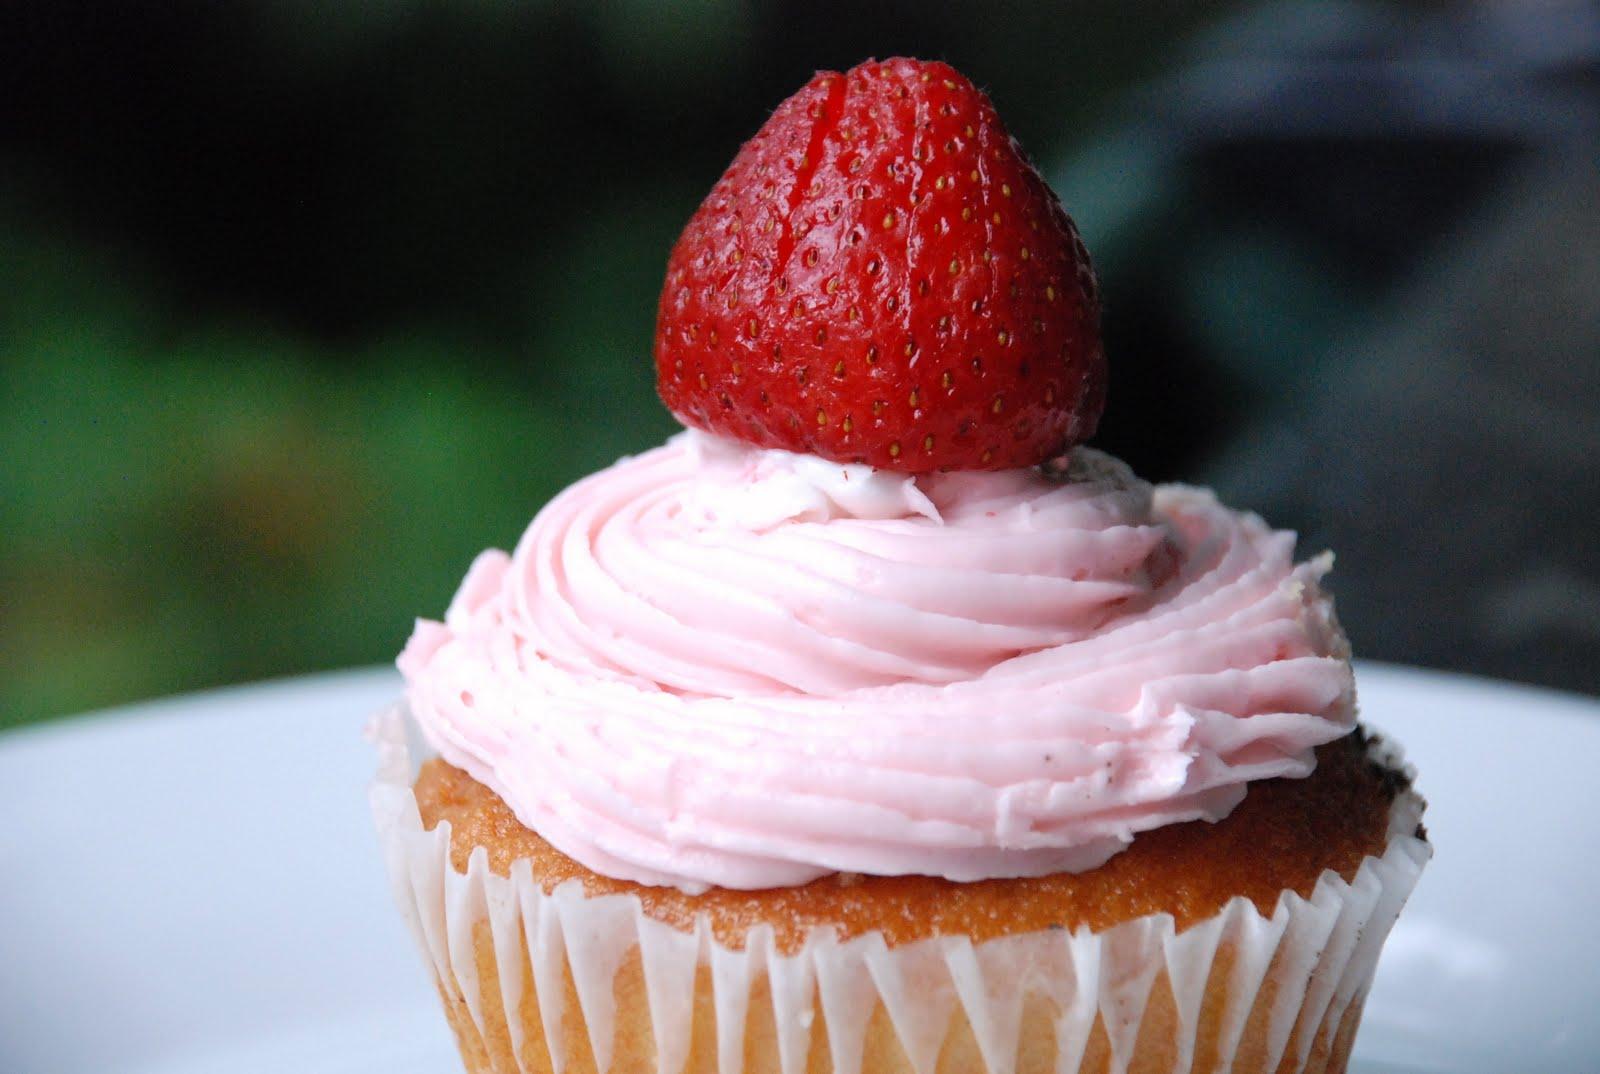 Cupcakes And Crablegs Strawberry Margarita Cupcakes